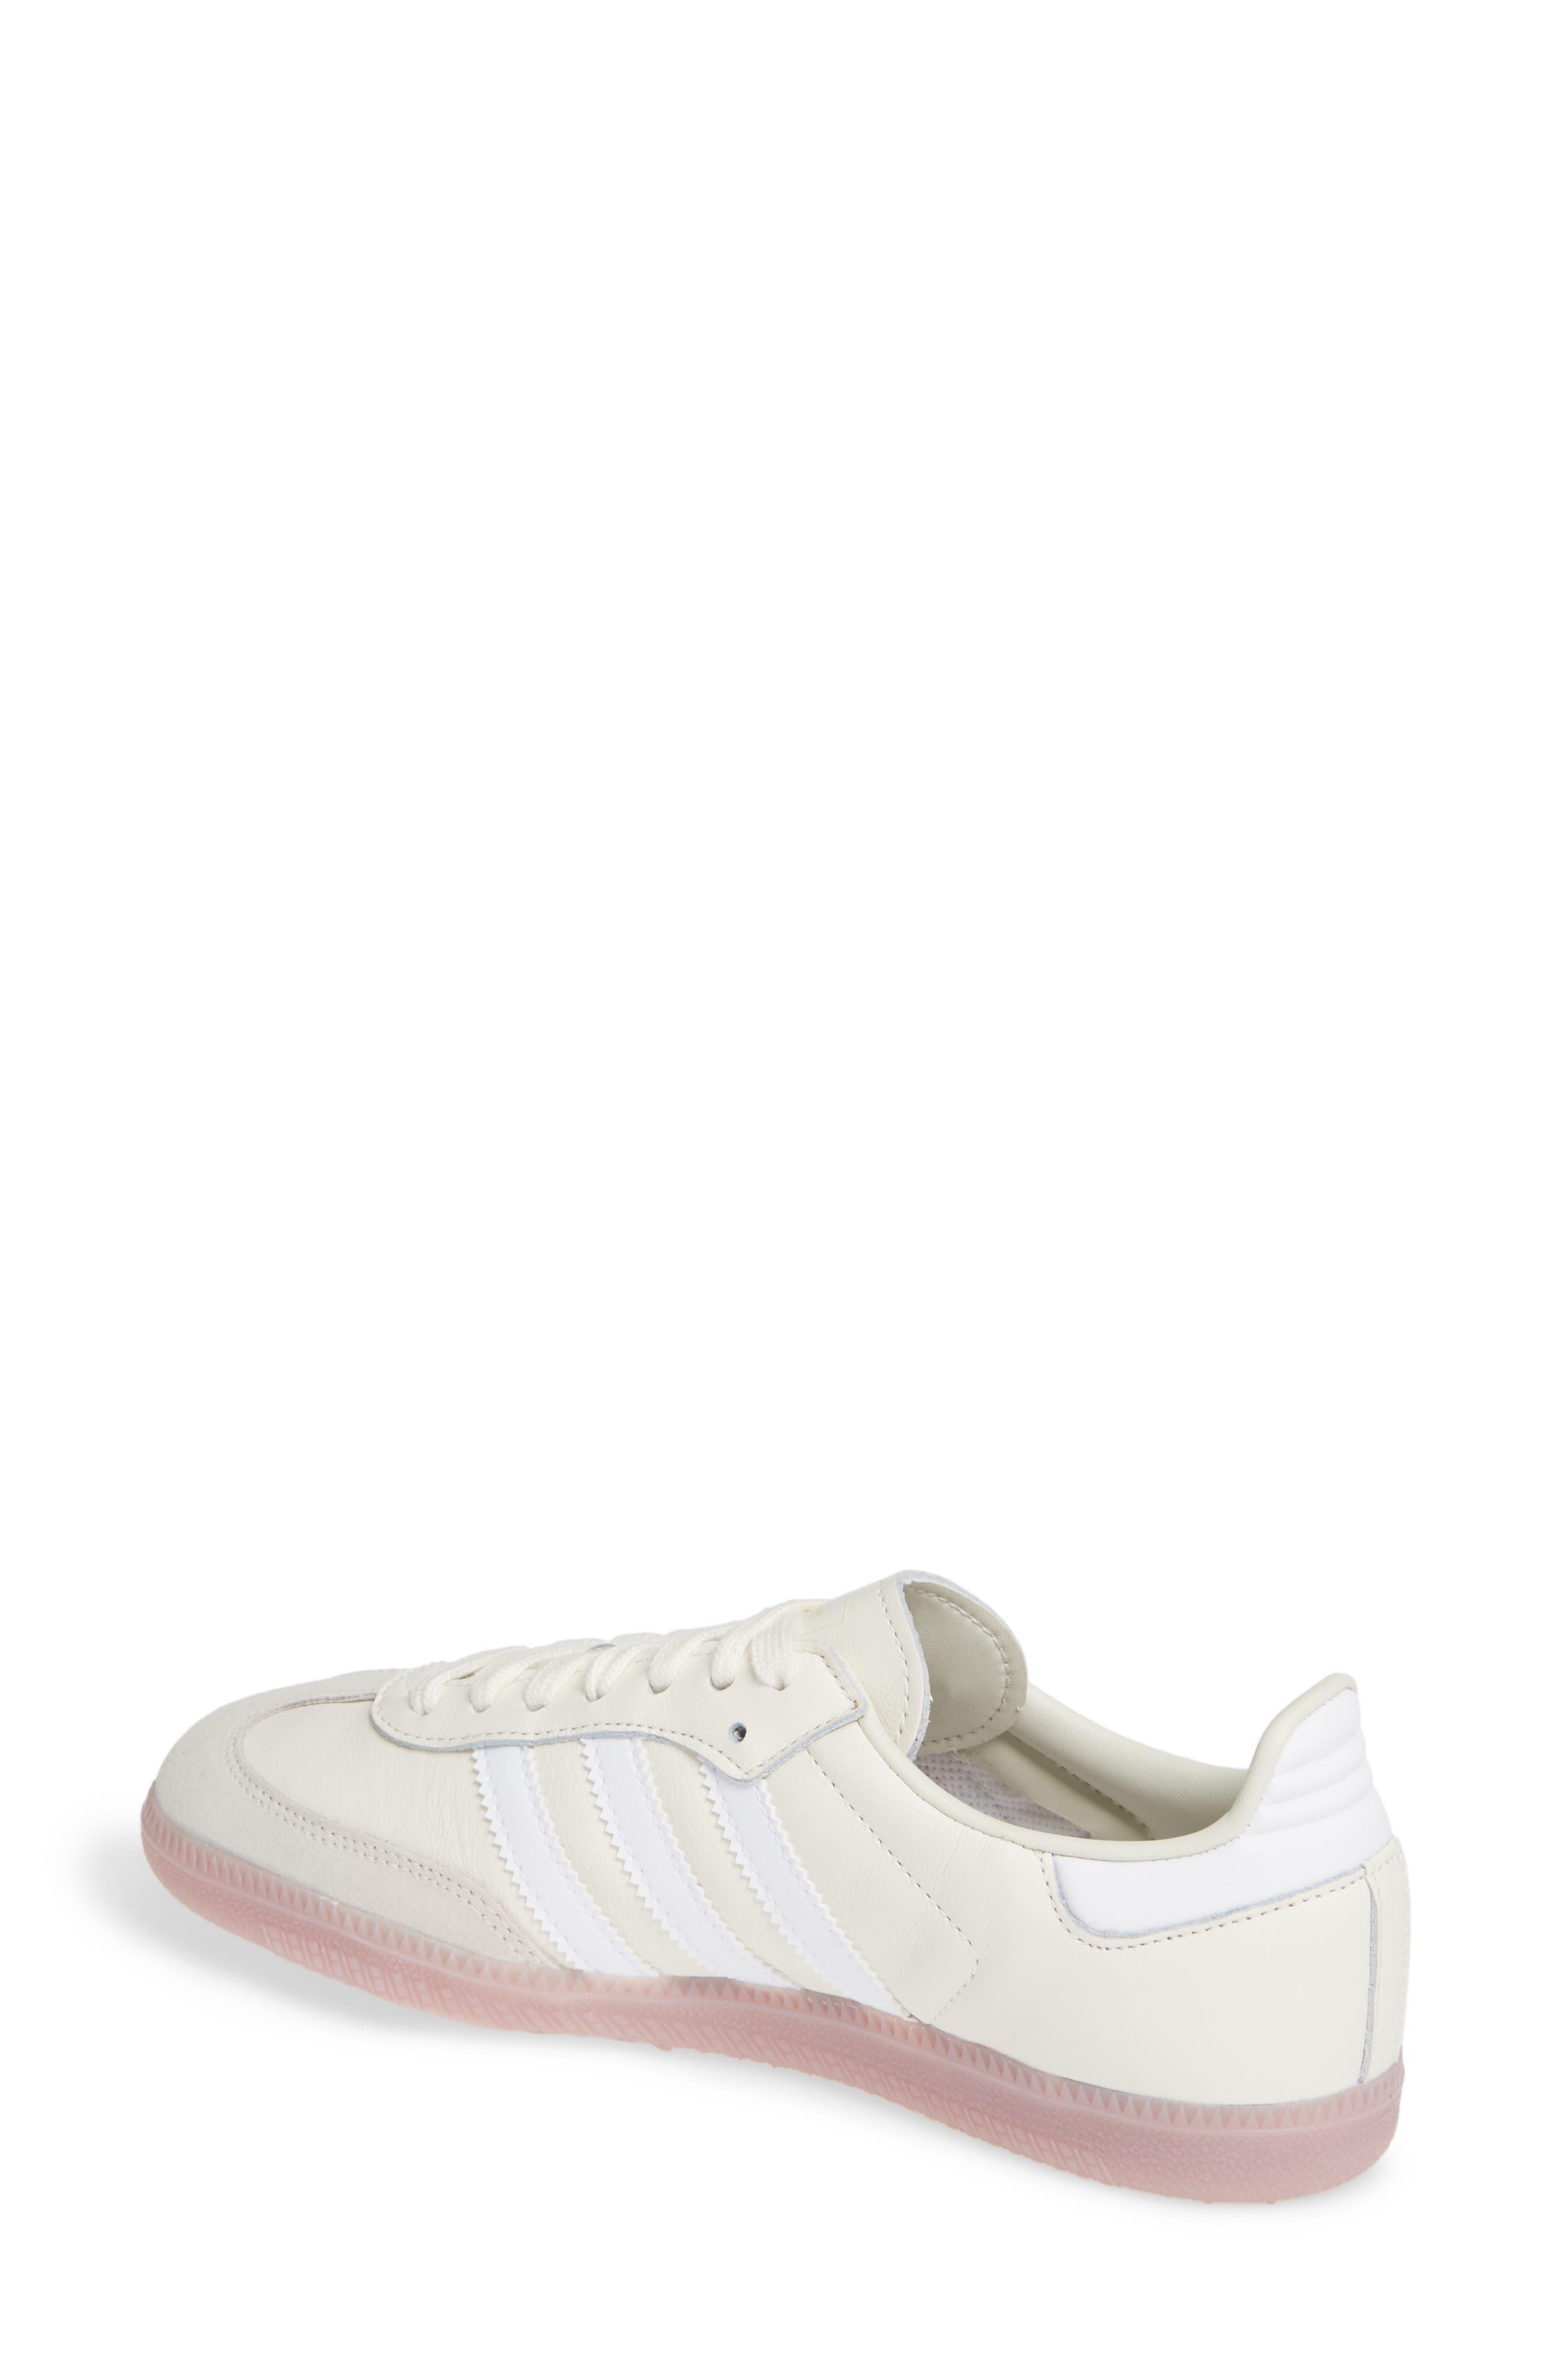 Samba Sneaker,                             Alternate thumbnail 2, color,                             OFF WHITE/ WHITE/ SOFT VISION